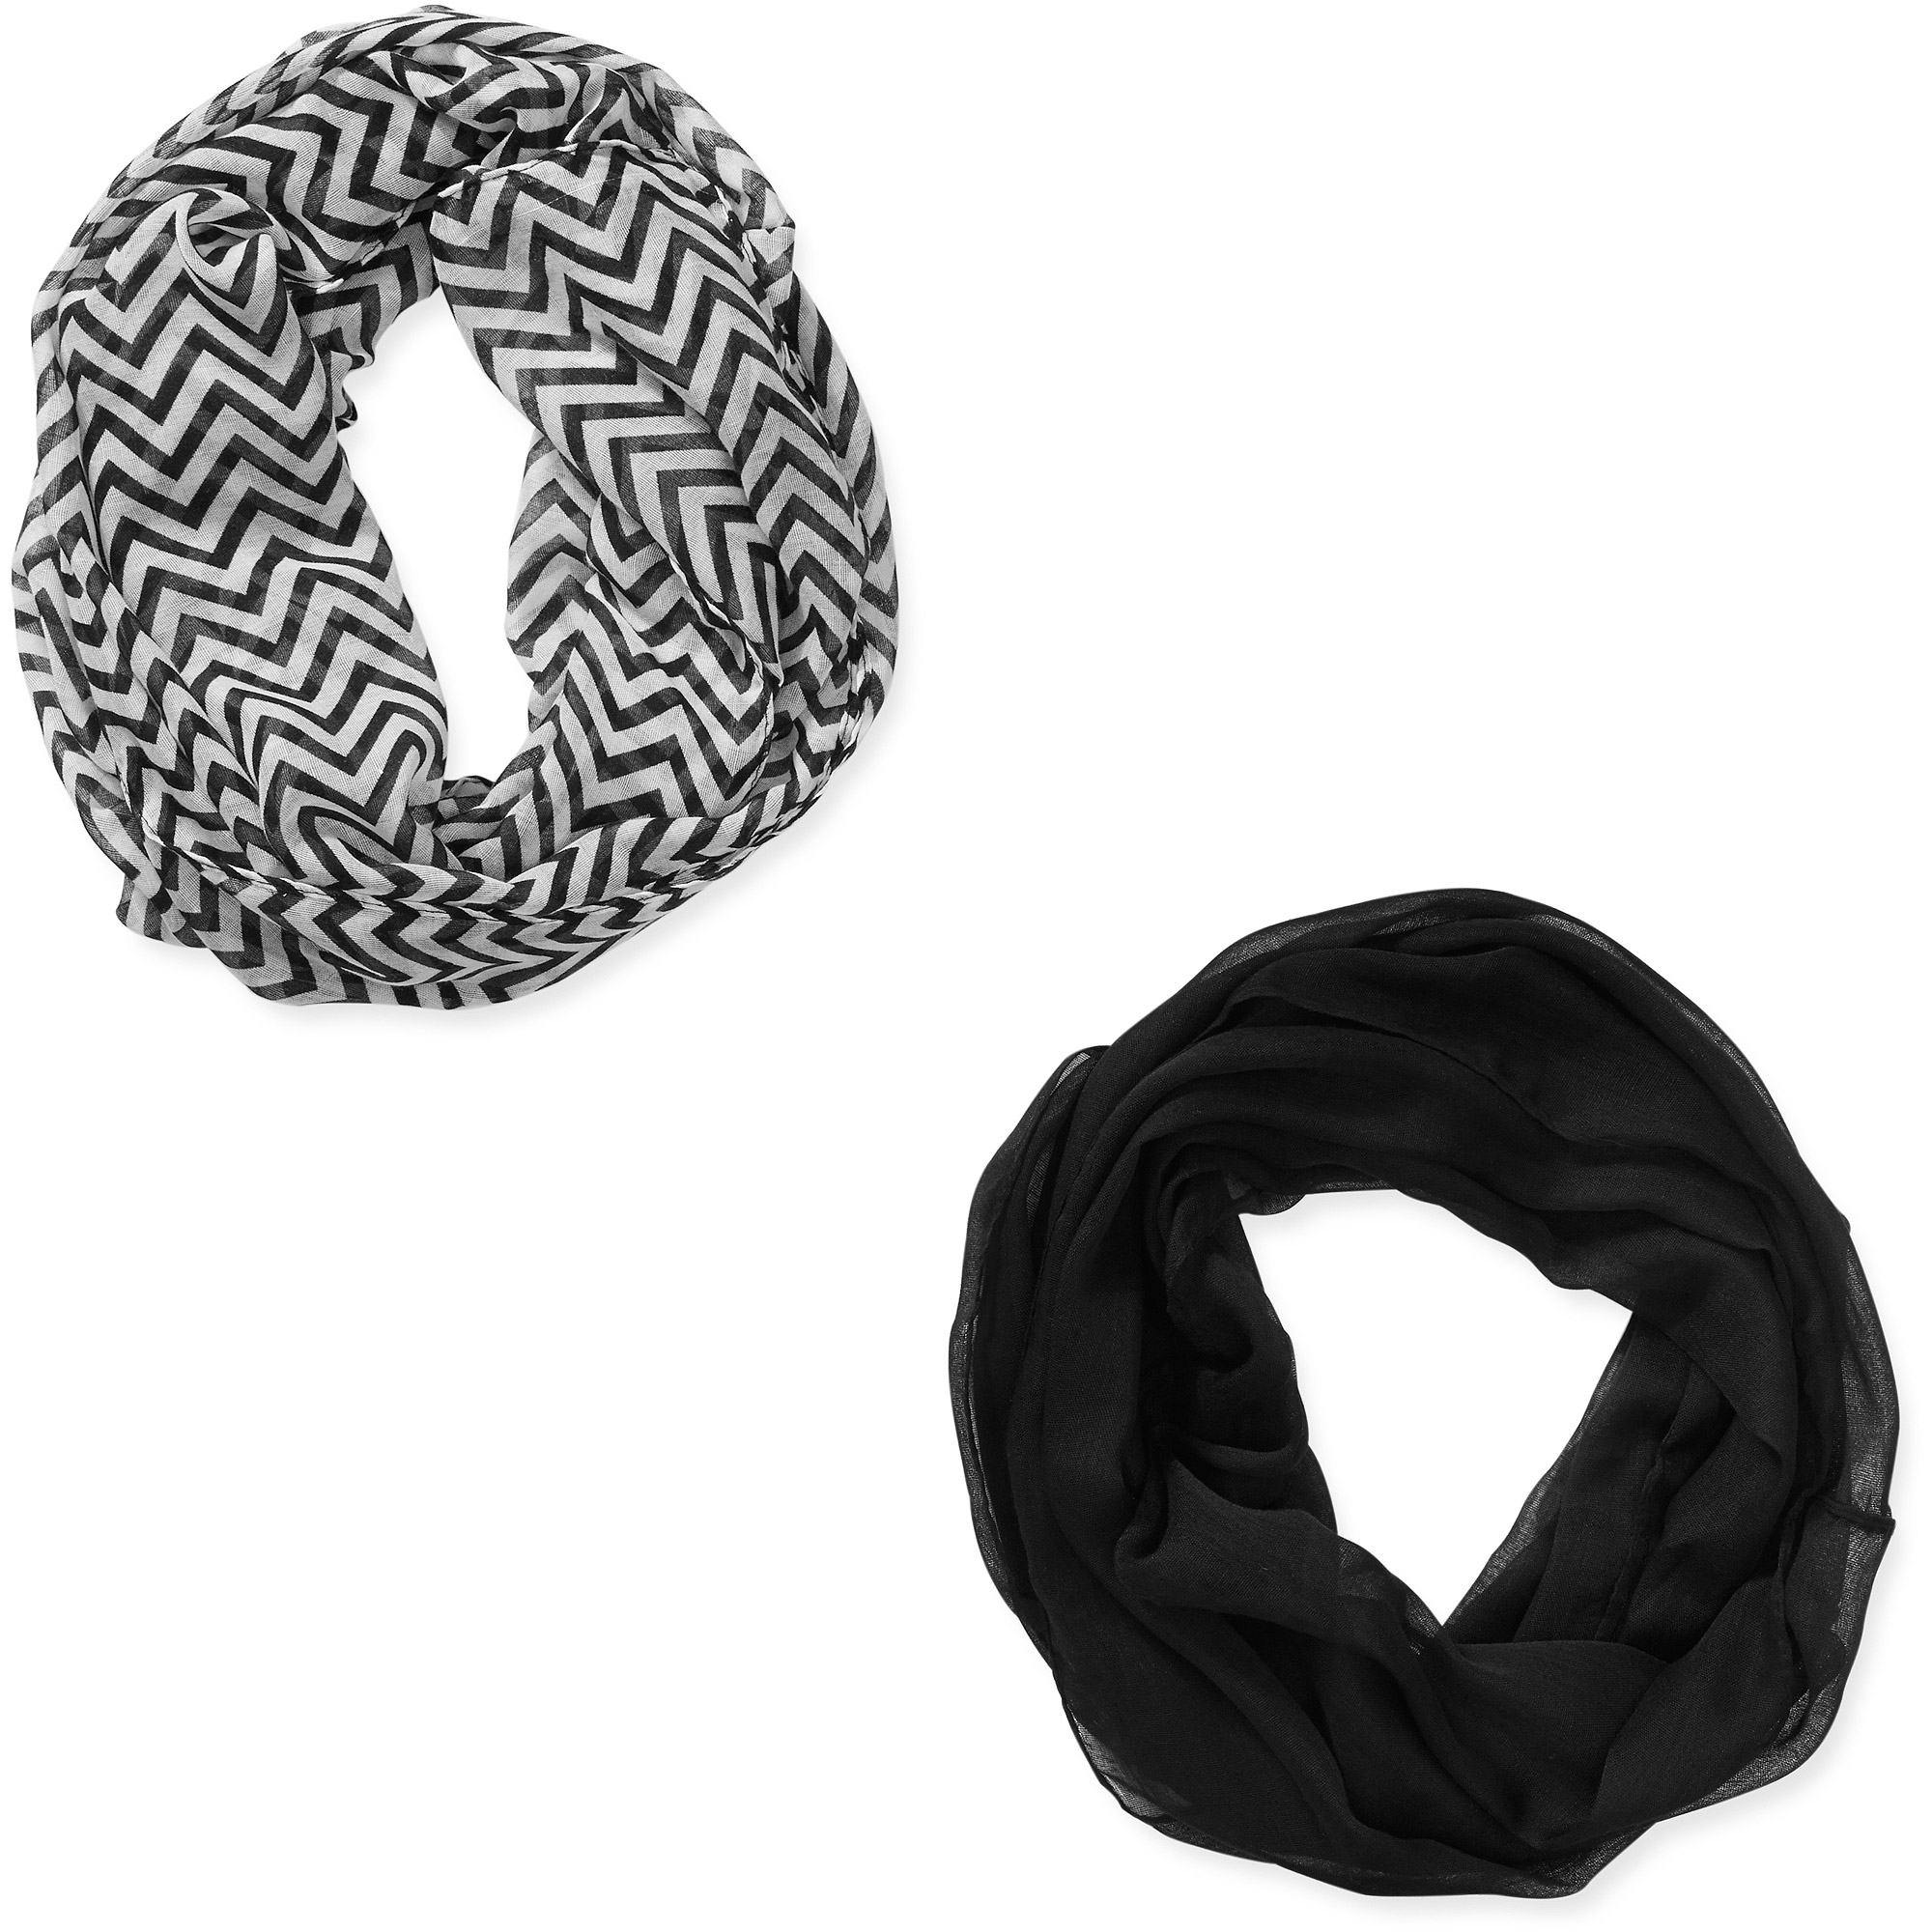 ^^women's Infinity Scarves 2 Pack